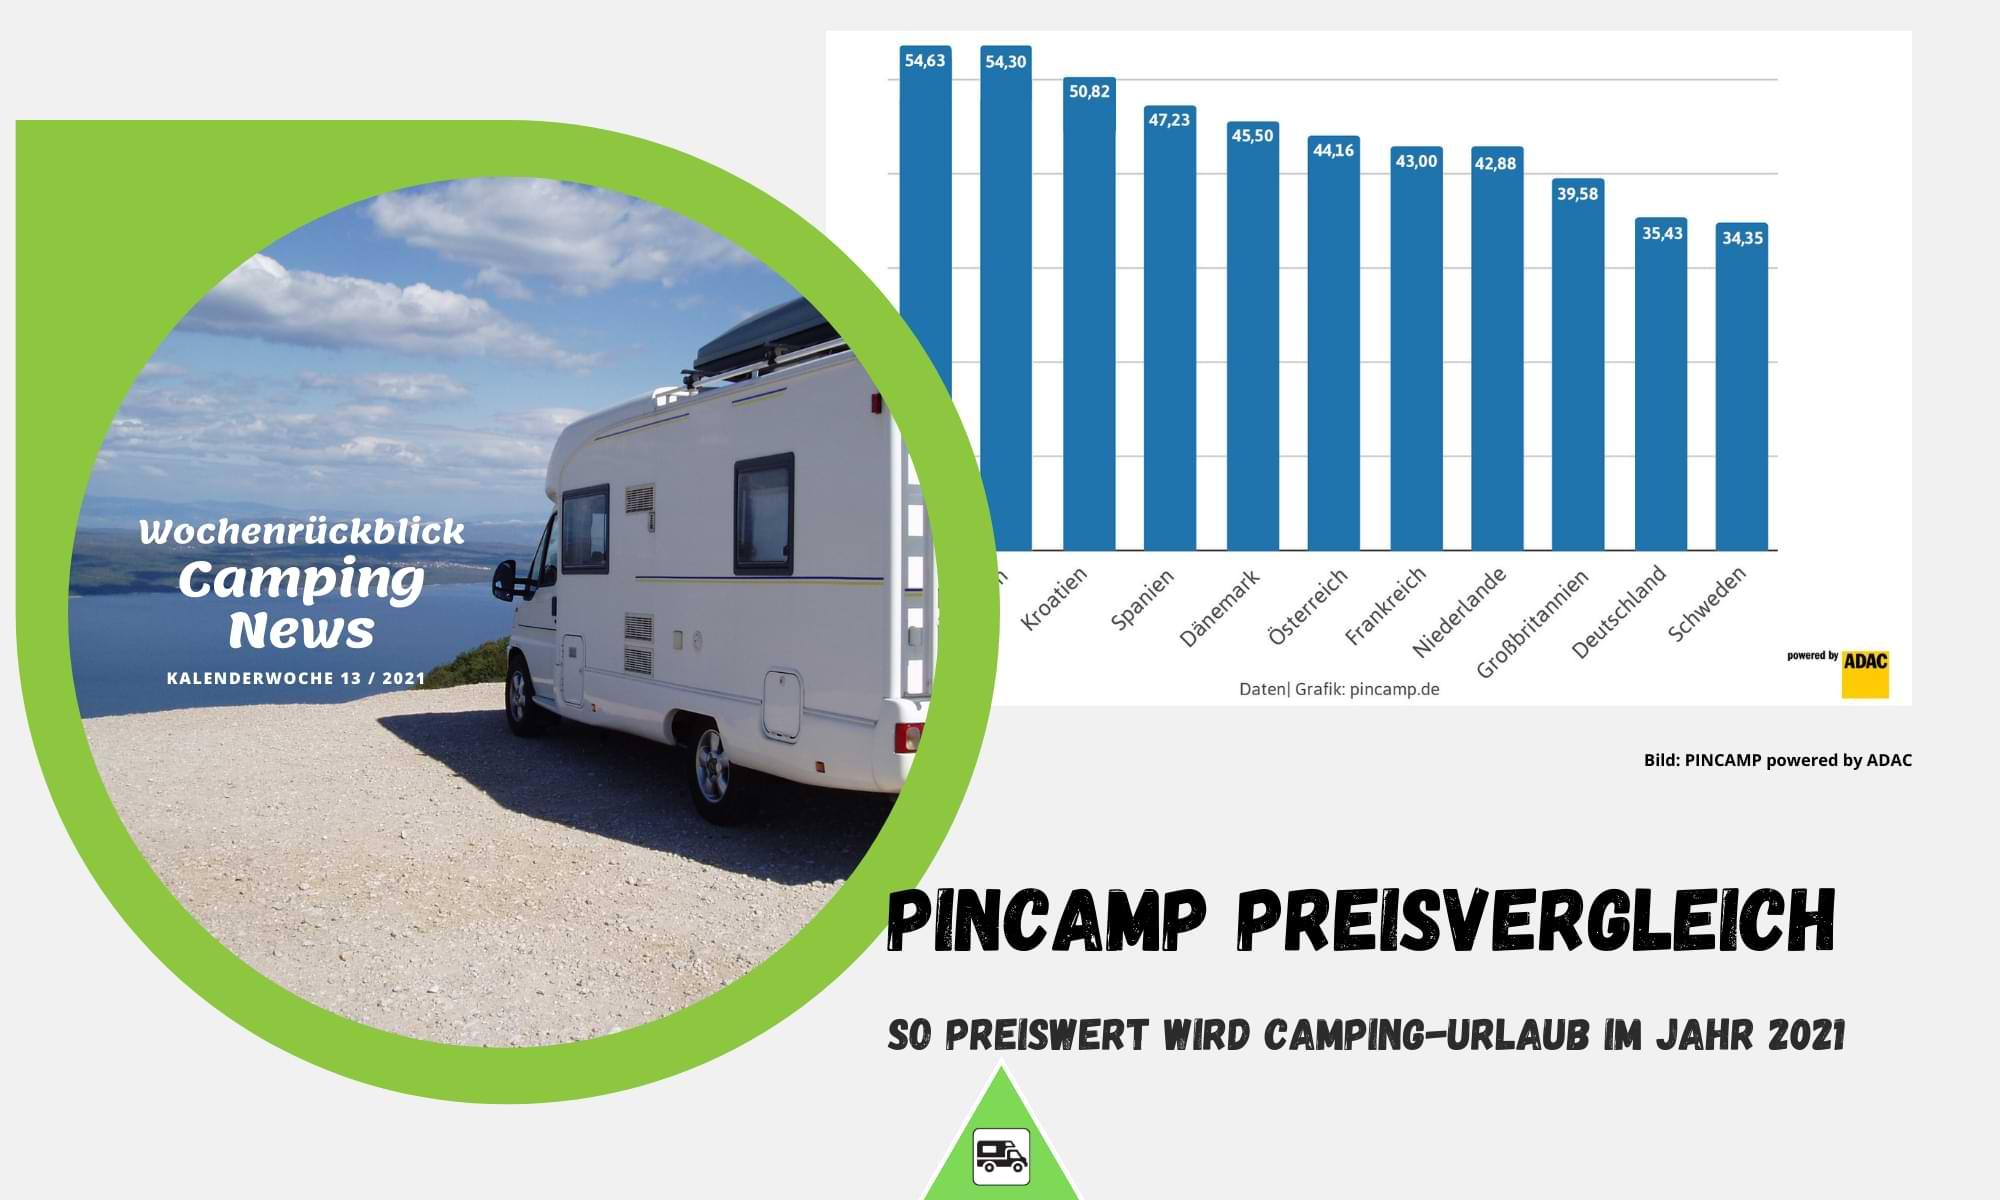 Campingplatz Preisvergleich – Campingurlaub 2021